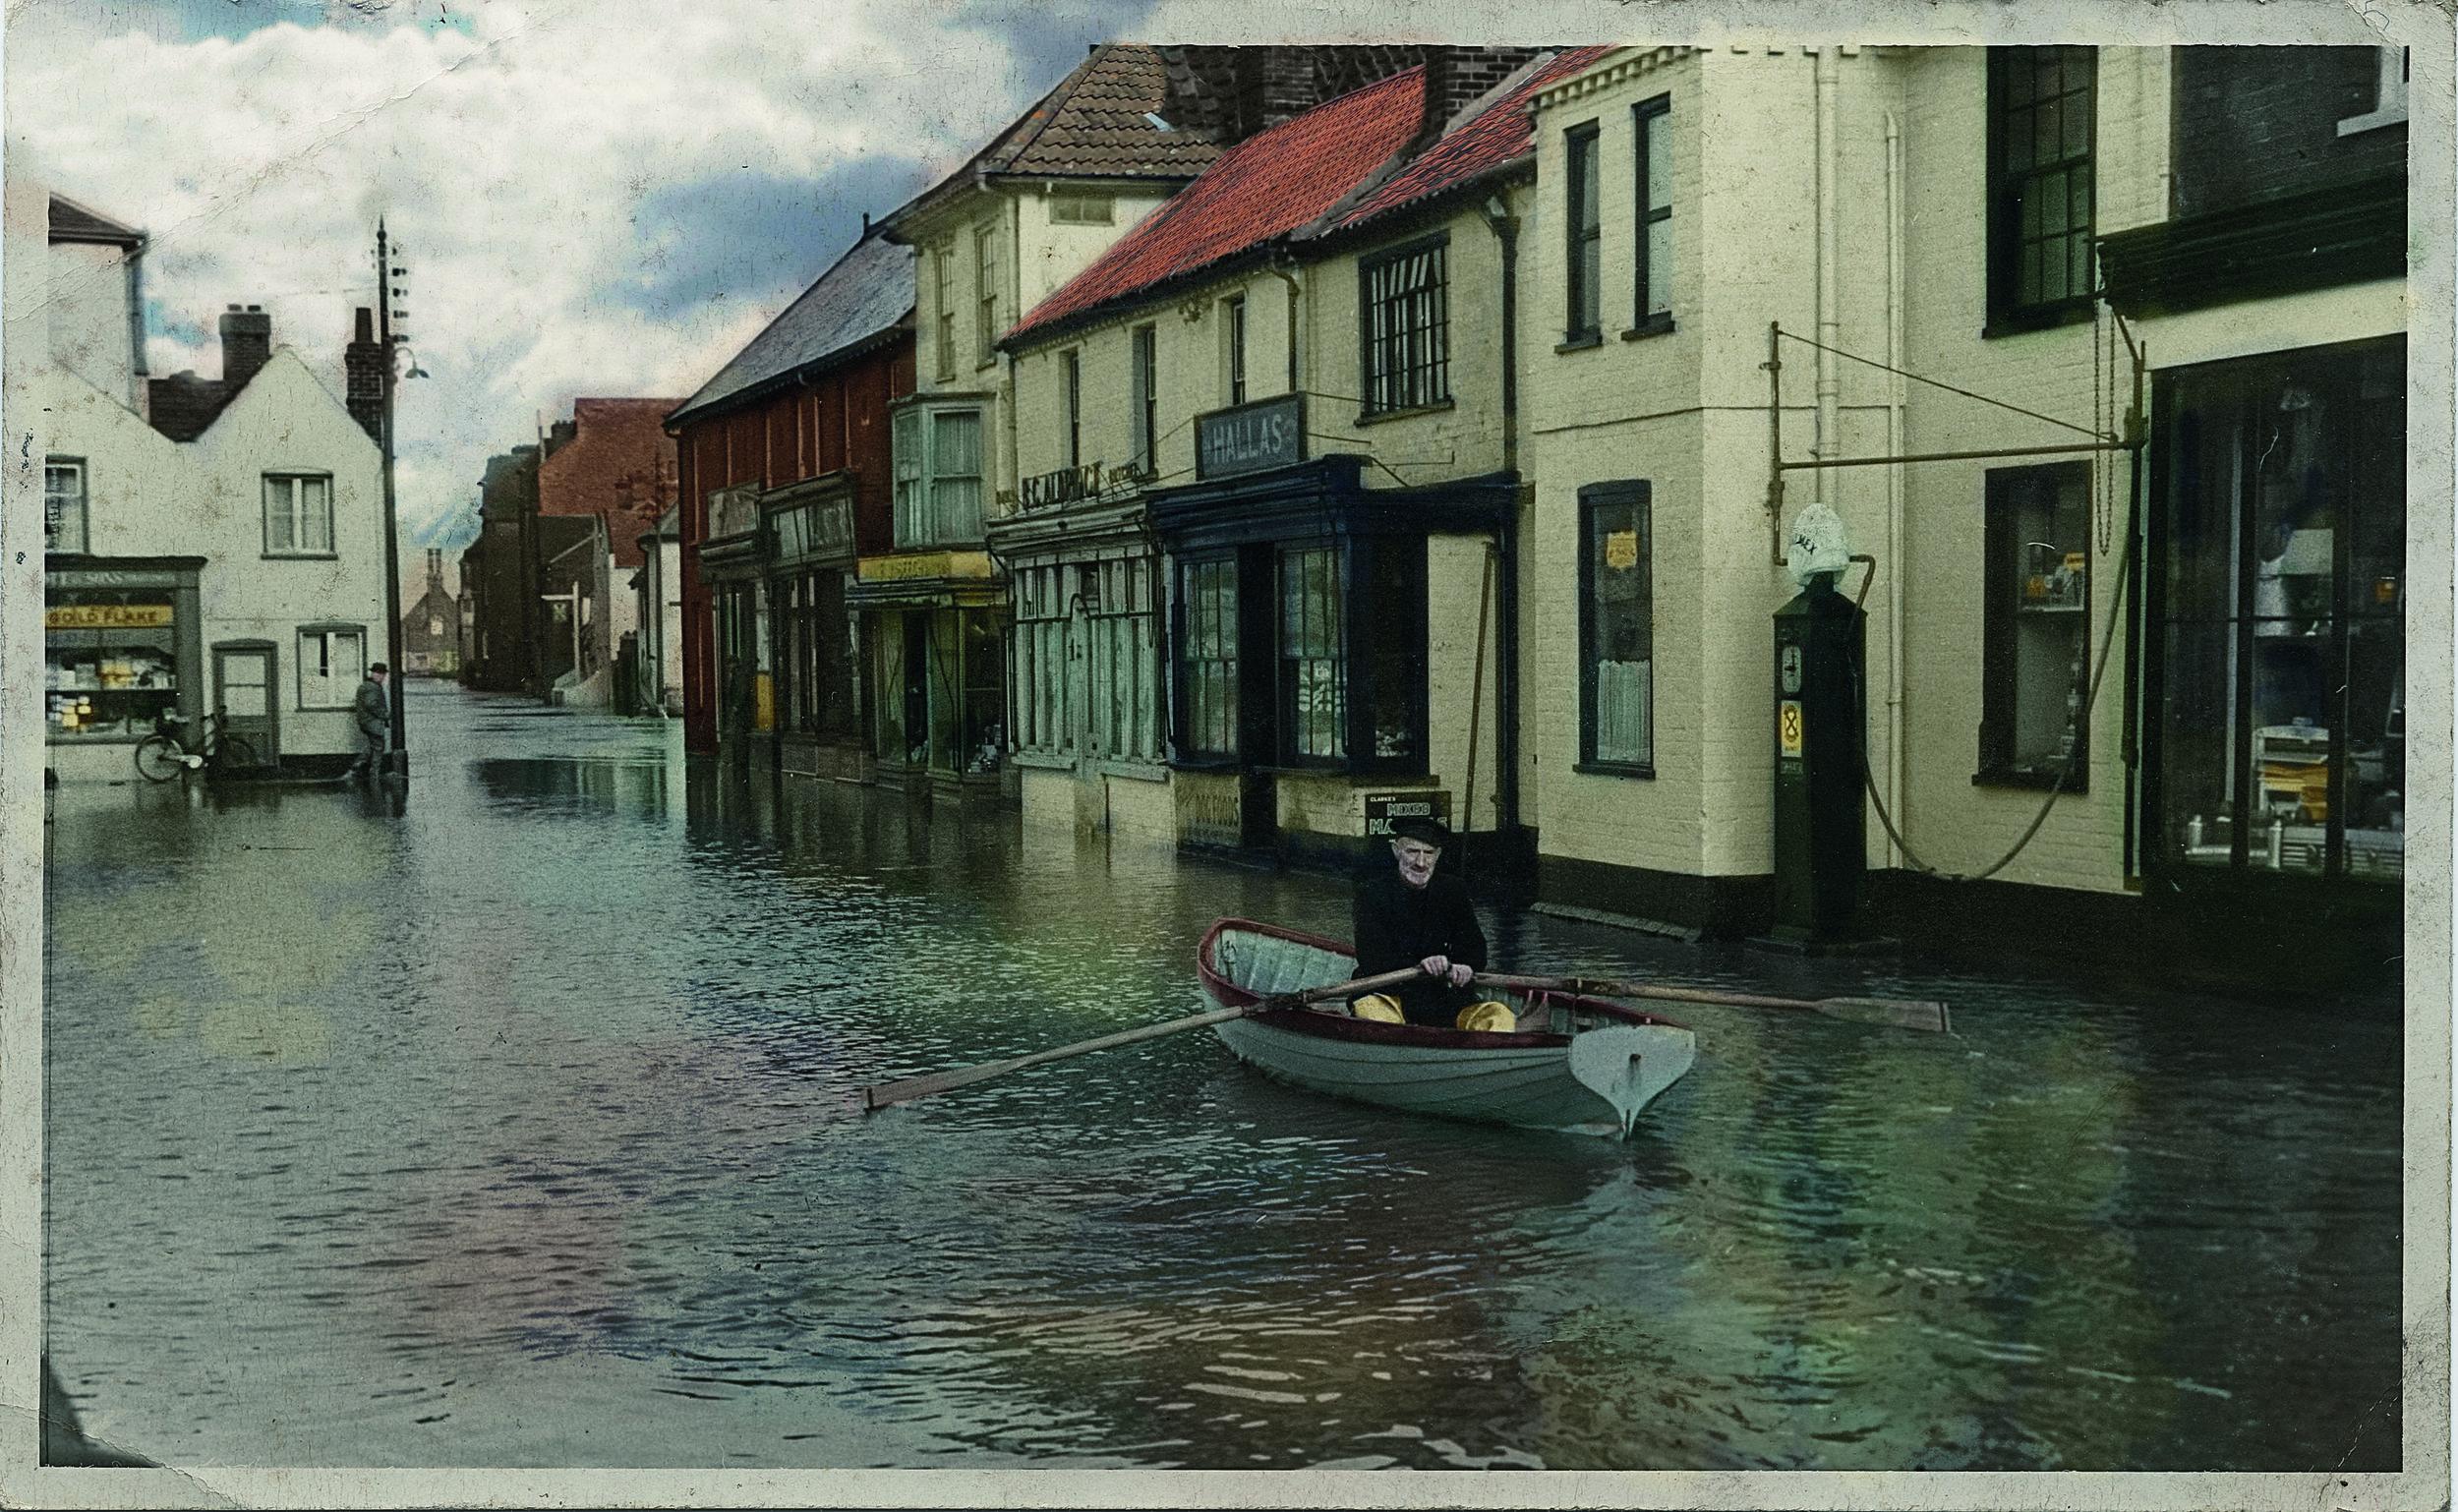 rowing boat aldeburgh flood 1953.jpg